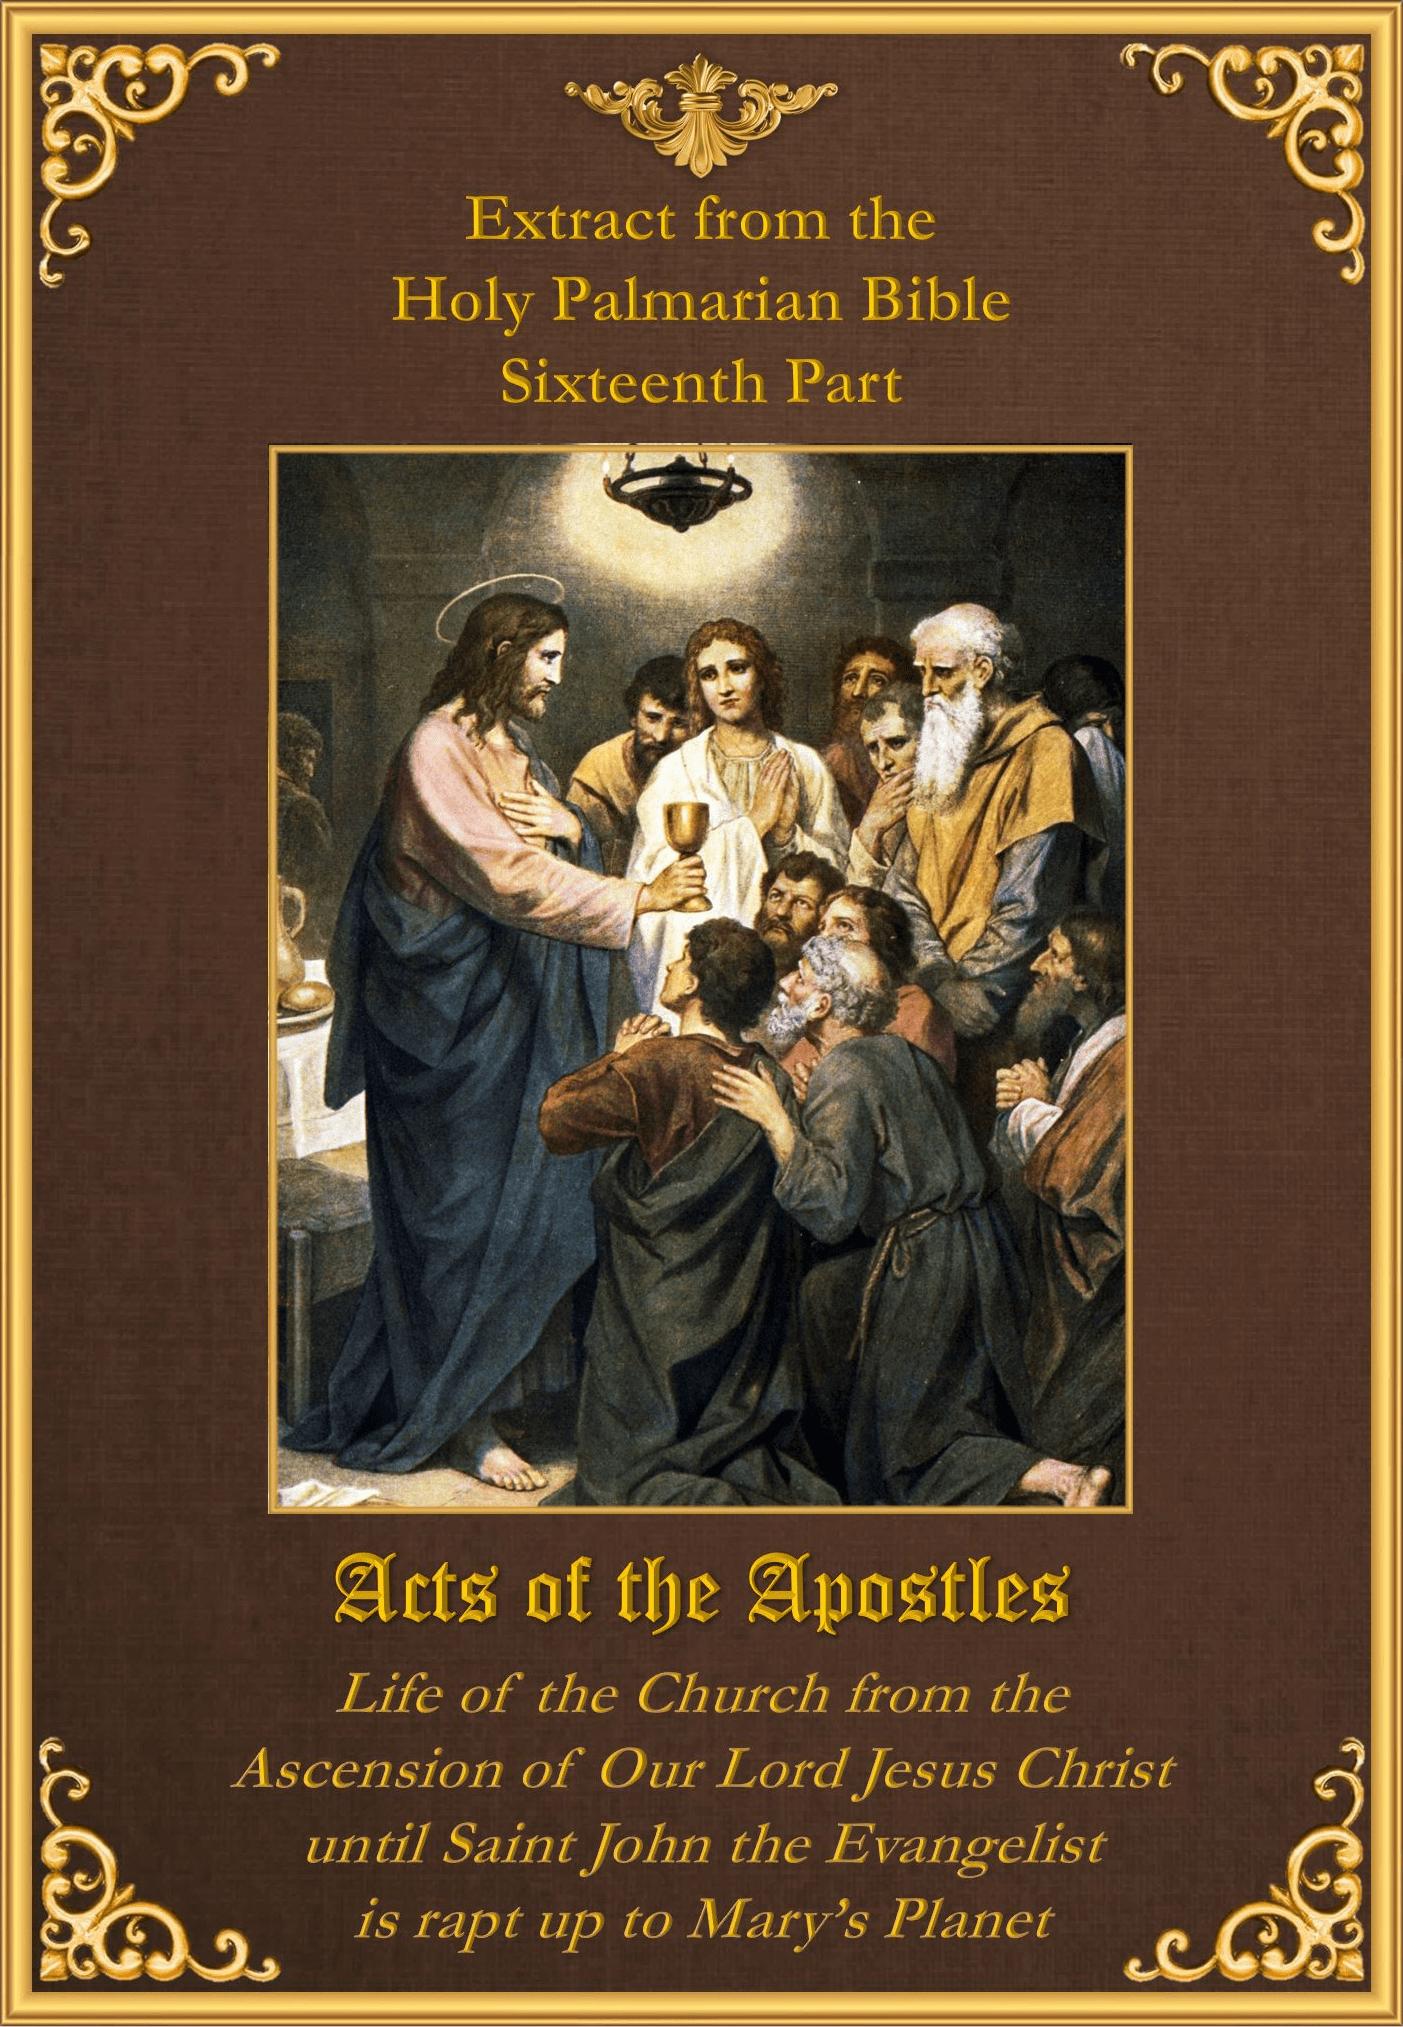 "<a href=""https://www.eglisepalmarienne.org/wp-content/uploads/2019/06/Acts-of-the-Apostles-English.pdf"" title=""Acts of the Apostles"">Acts of the Apostles<br><br>En Savoir Plus</a>"